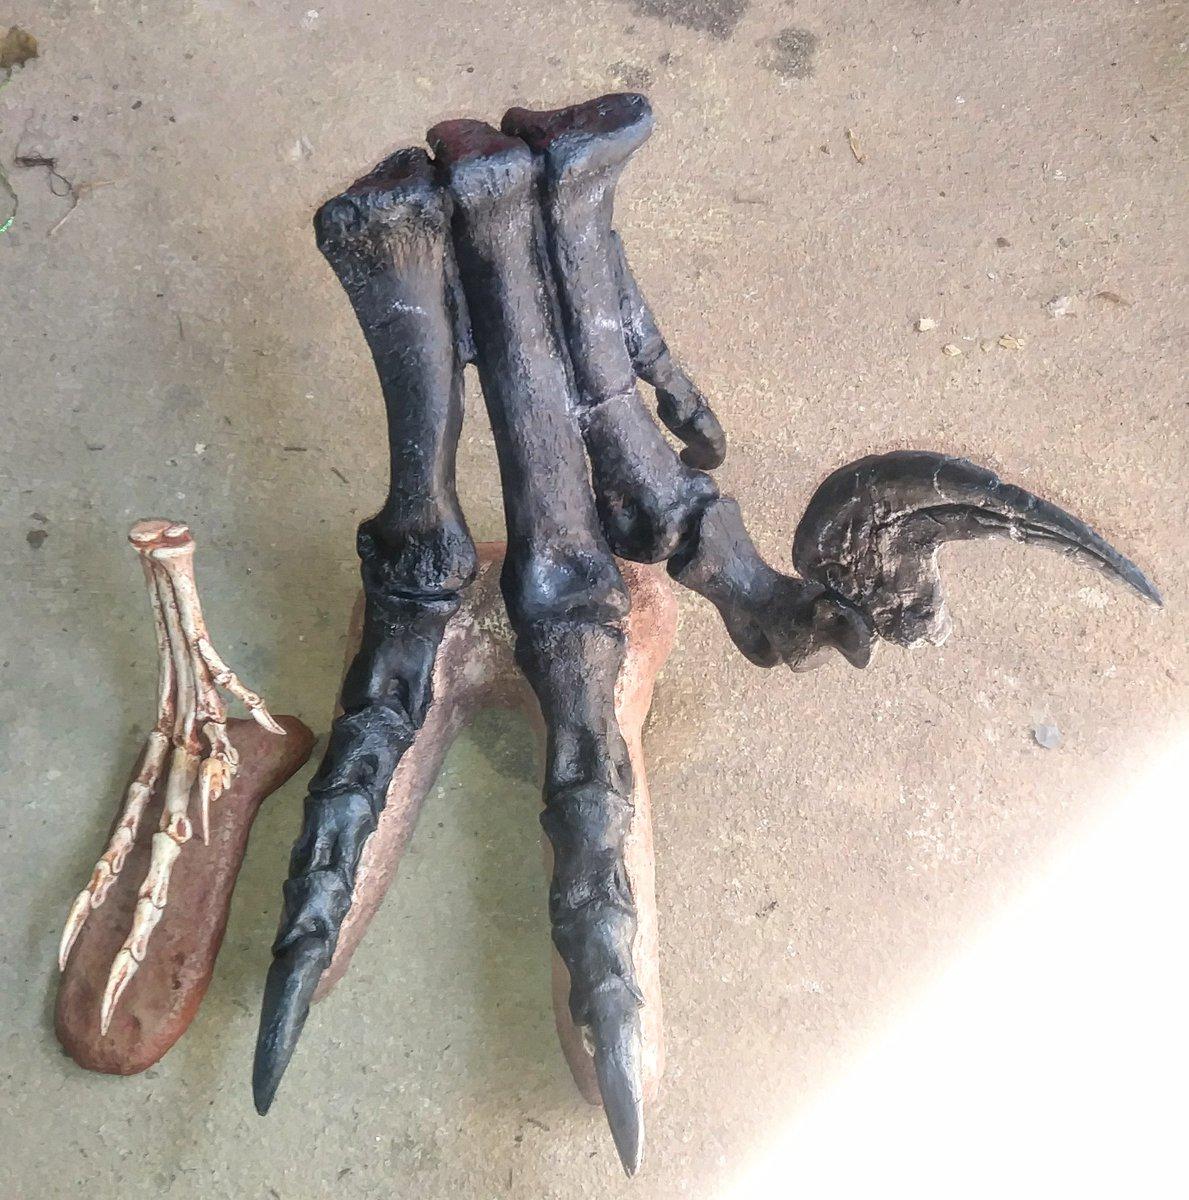 RT @PaleoCameron: Velociraptor mongoliensis foot (left) beside a Utahraptor ostrommaysi foot (right). Whoa right? https://t.co/2tTxPwgZMn